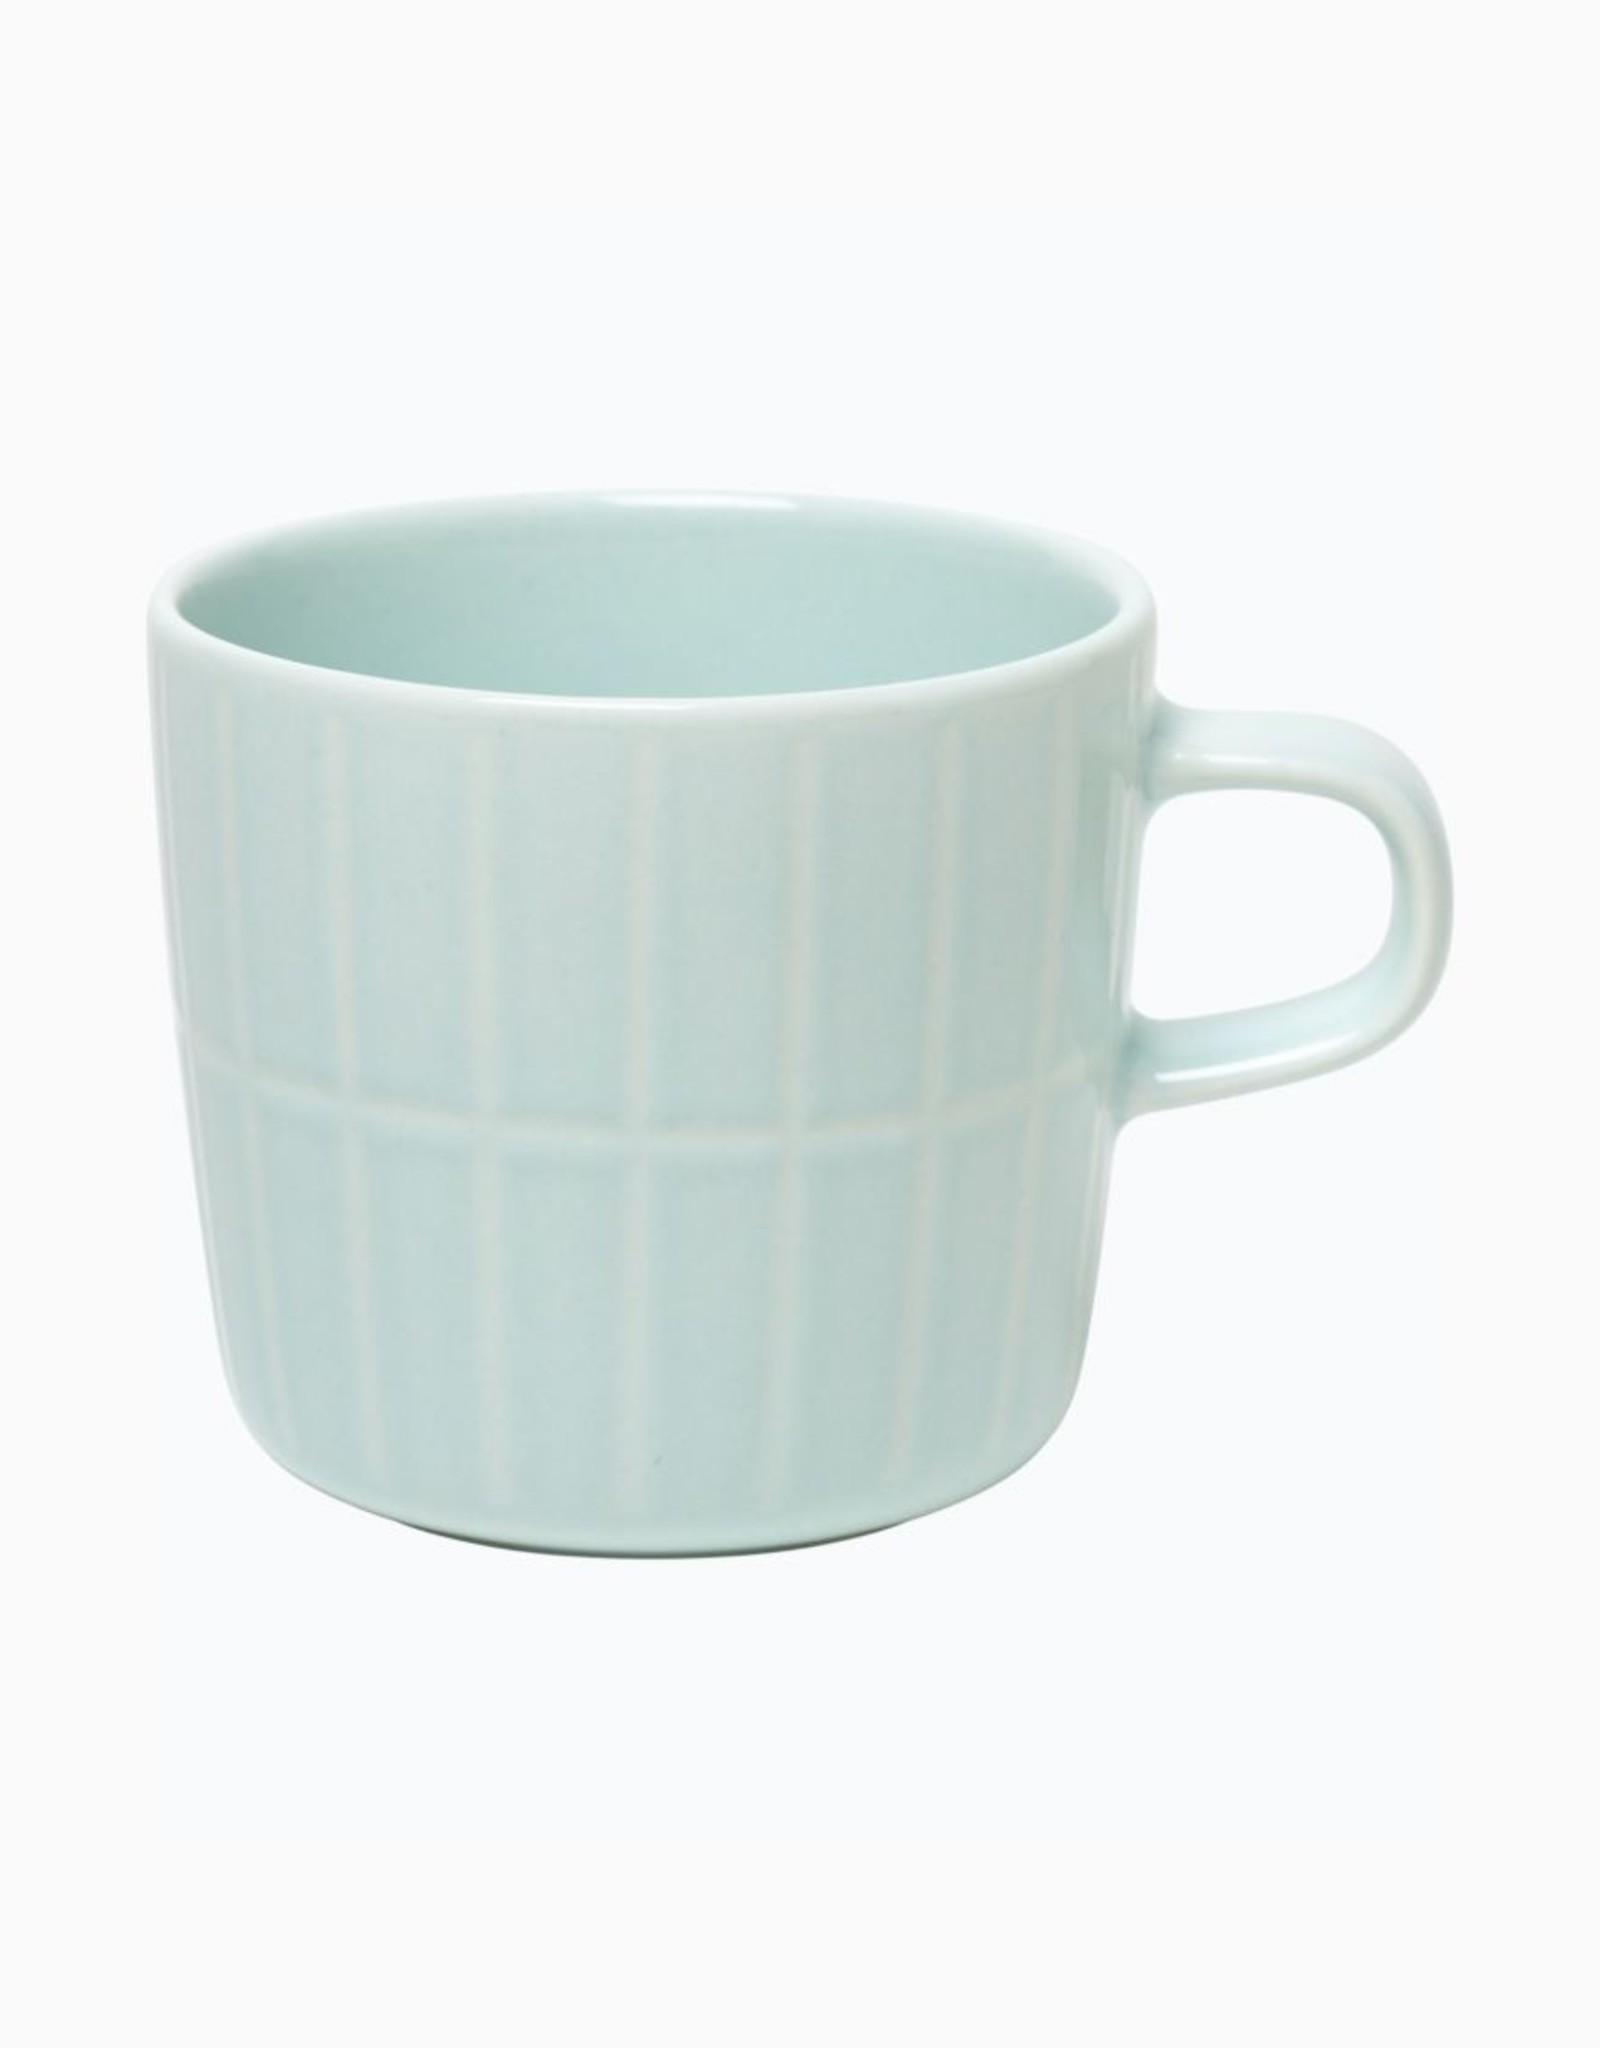 Marimekko Marimekko Tiilskivi Koffietas Mint Gestreept